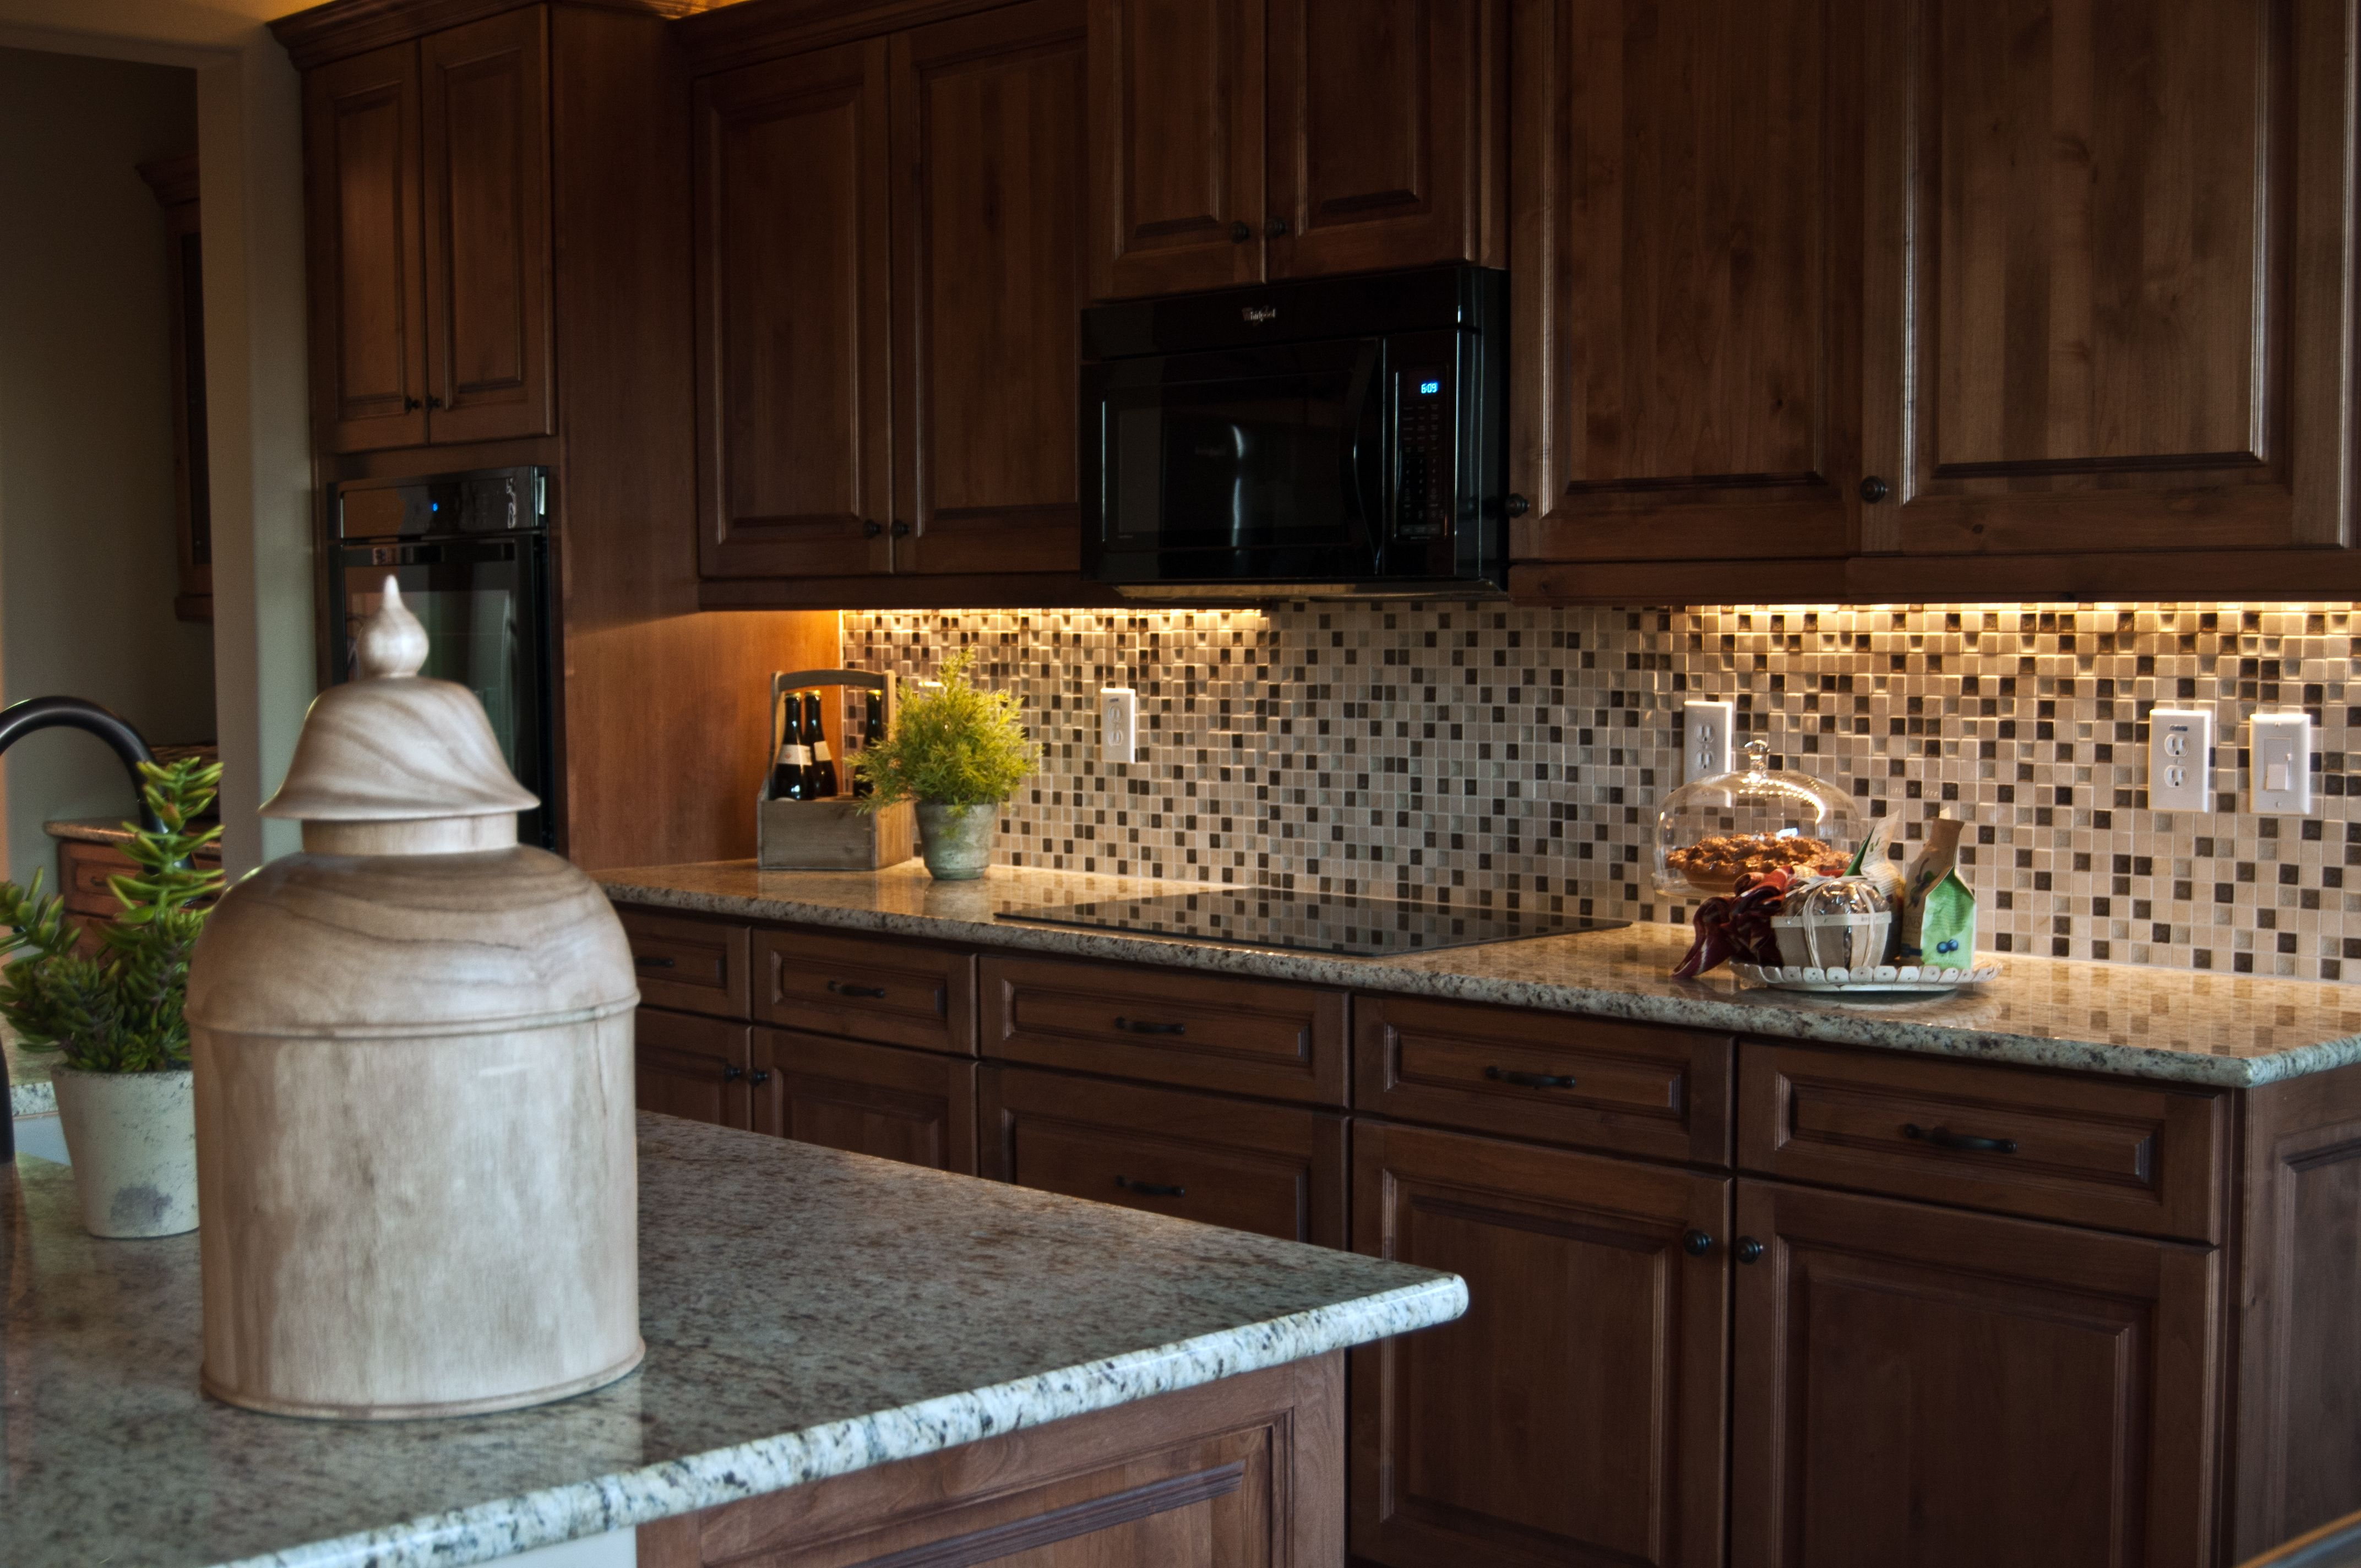 Inspired Led Warm White Under Cabinet Lighting